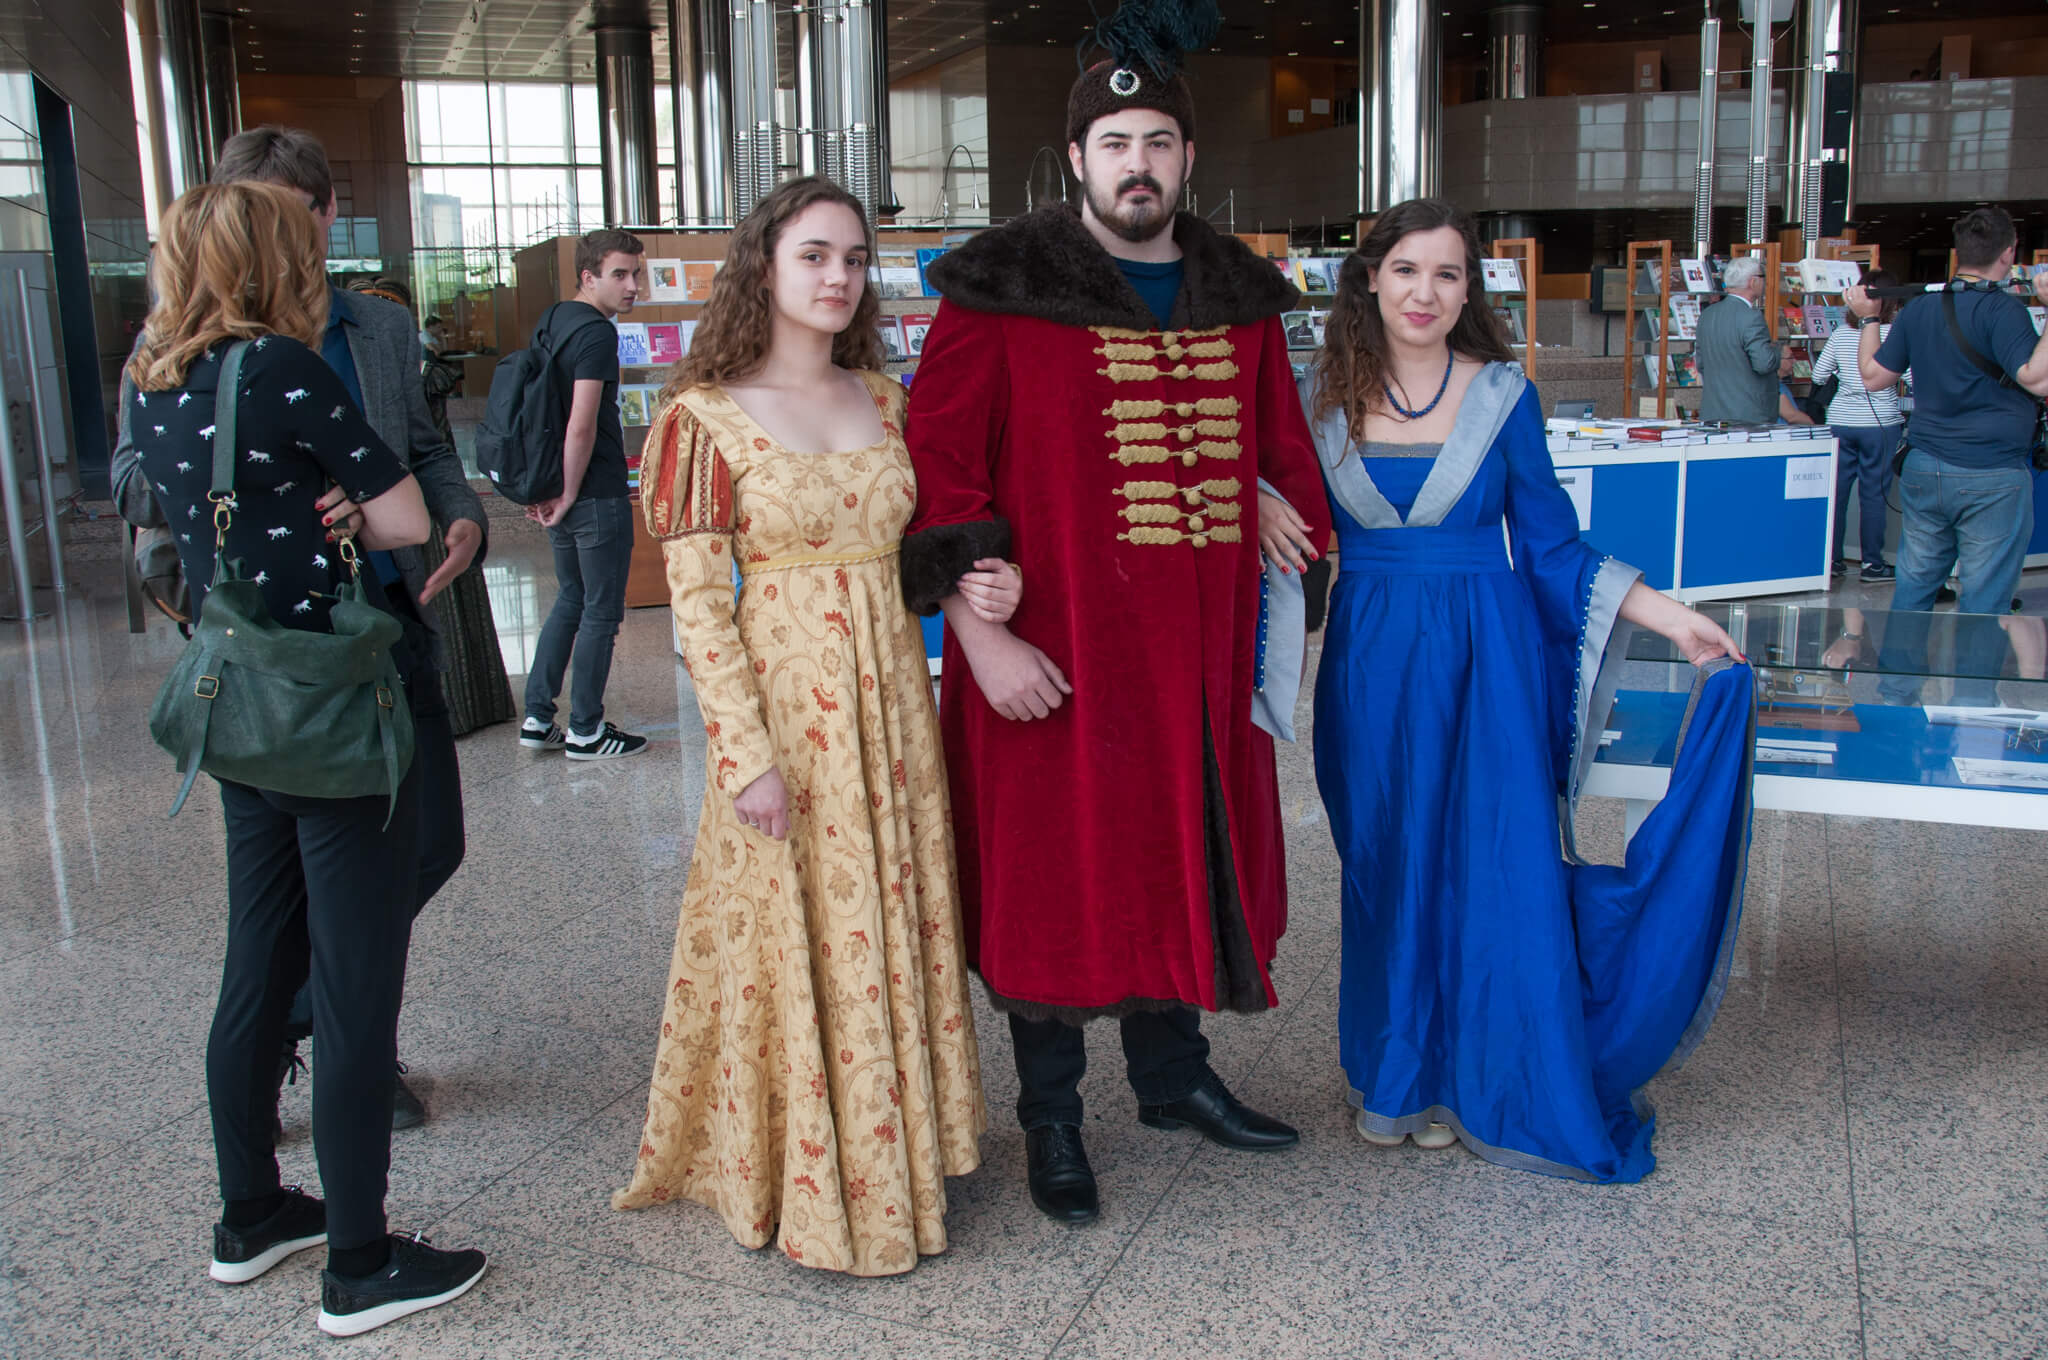 Održan Festival povijesti Kliofest 2018.